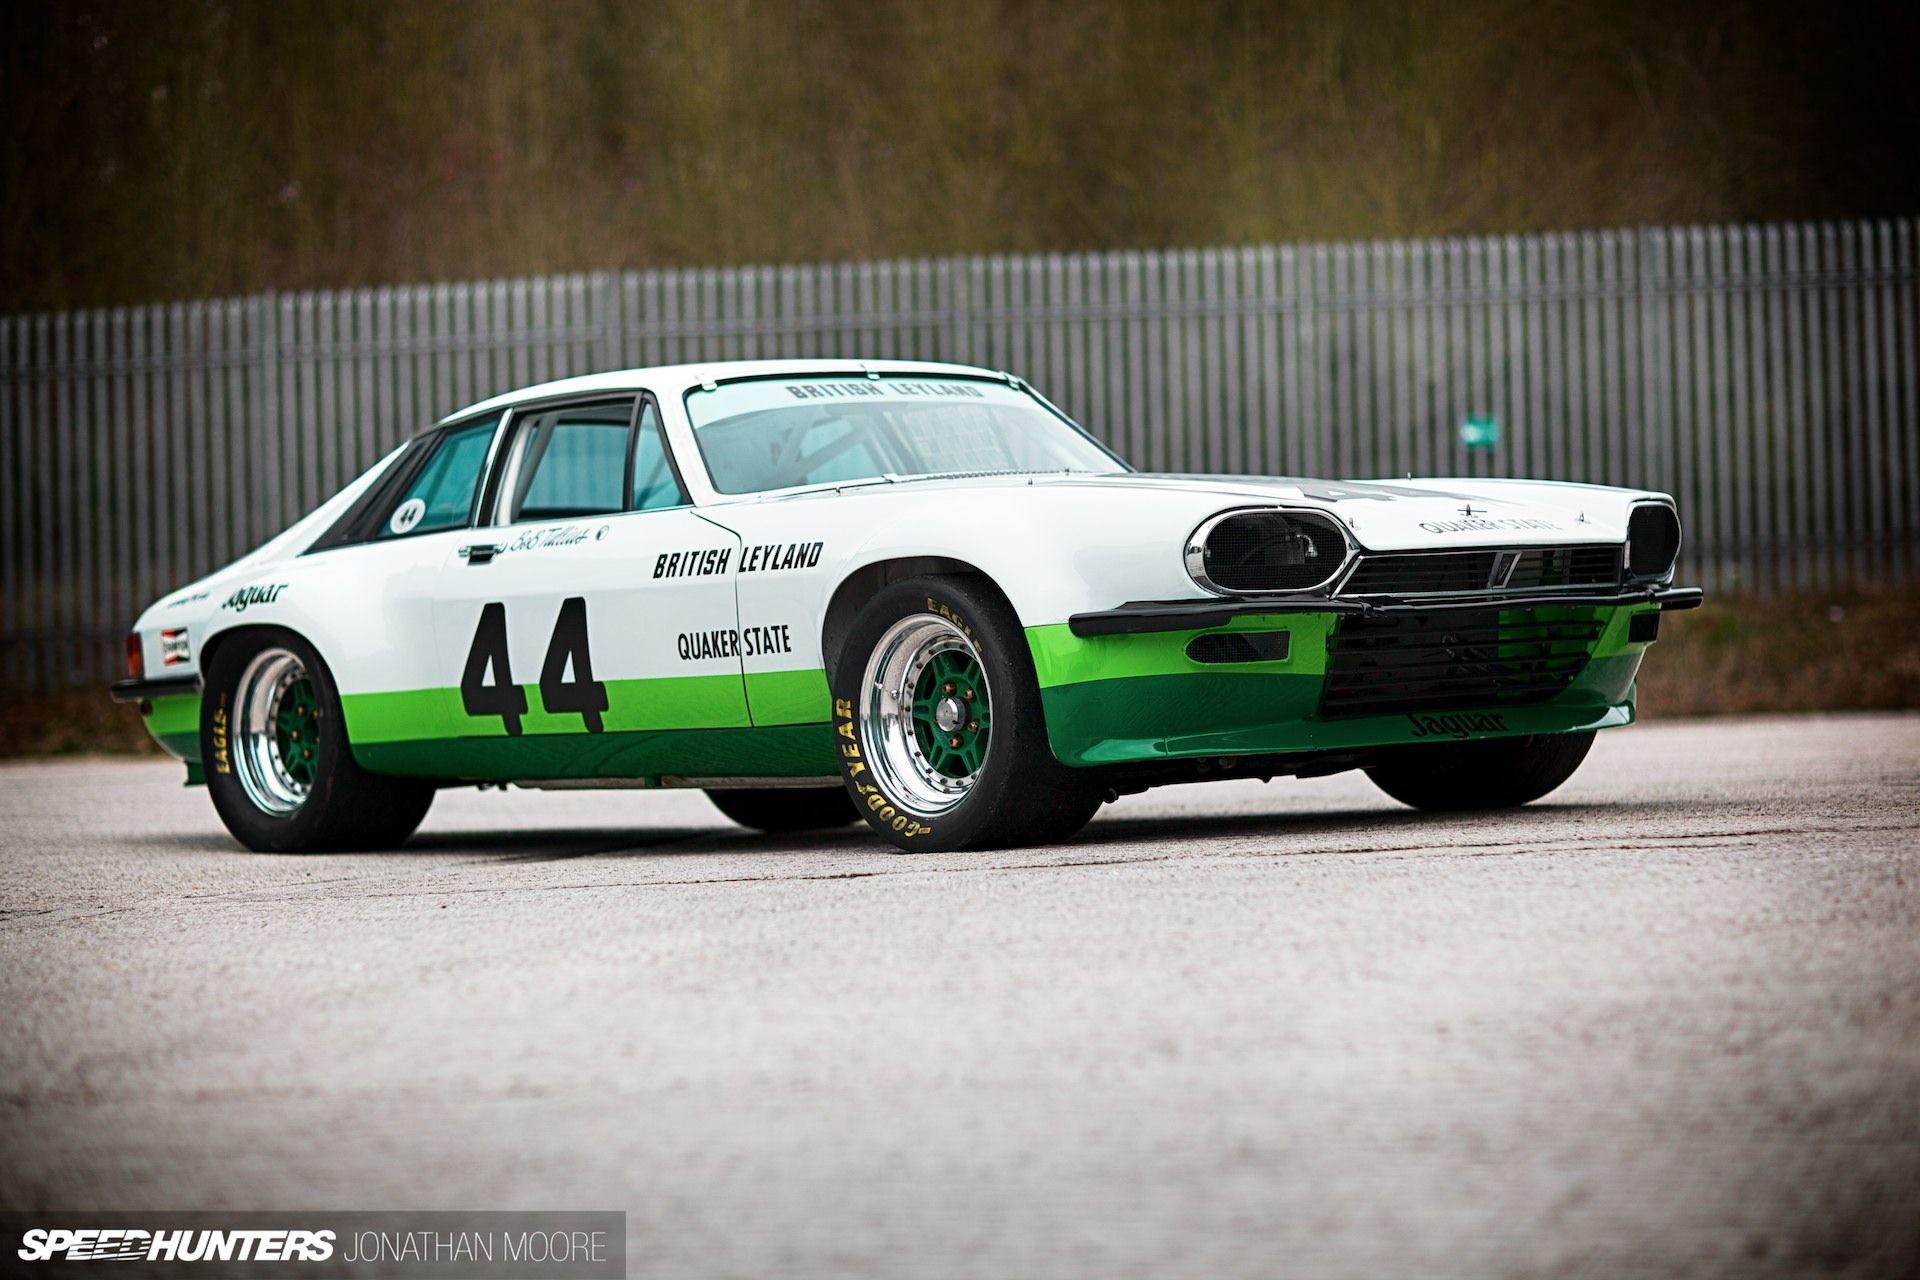 Jaguar XJS Trans Am-series Racecar | Classic Cars | Pinterest | Cars